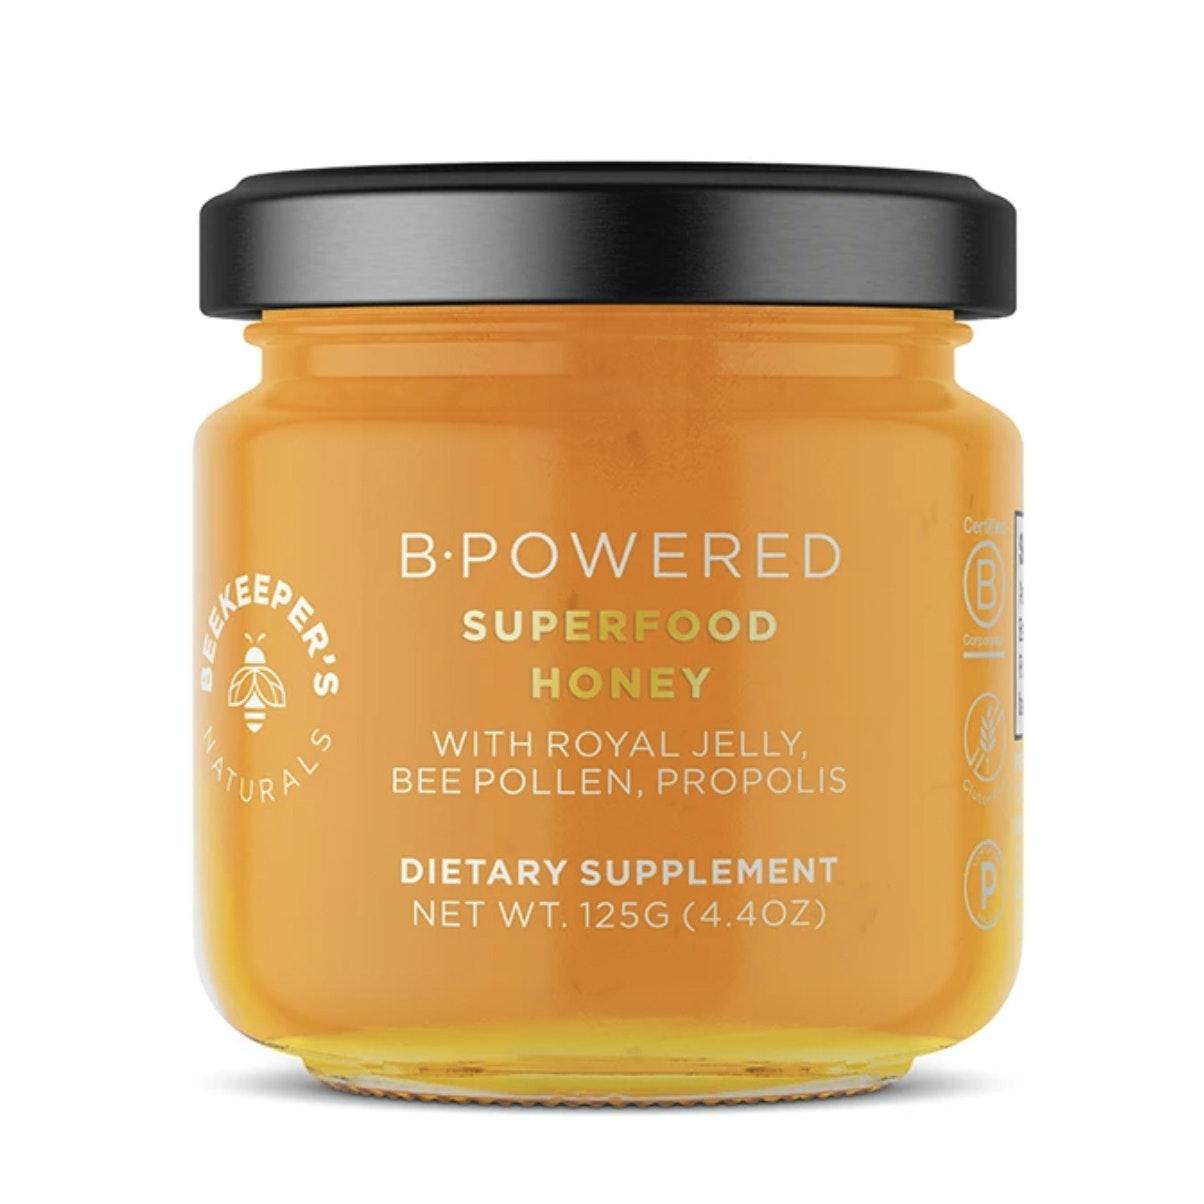 Beekeeper's Naturals® B.Powered™ Superfood Honey